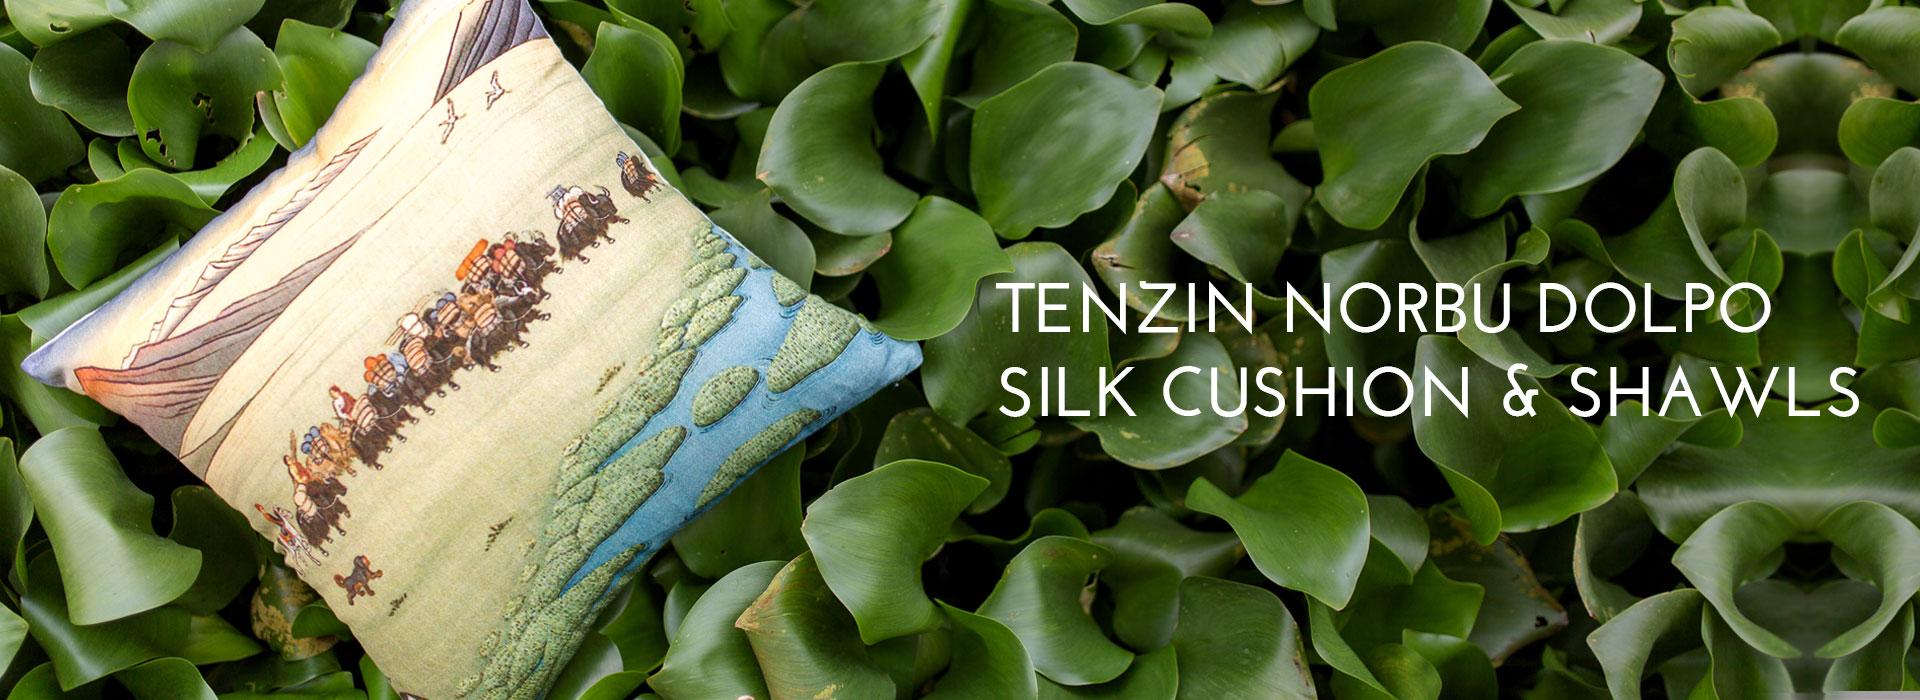 Tenzin Norbu Dolpo Silk Cushion & Shawls